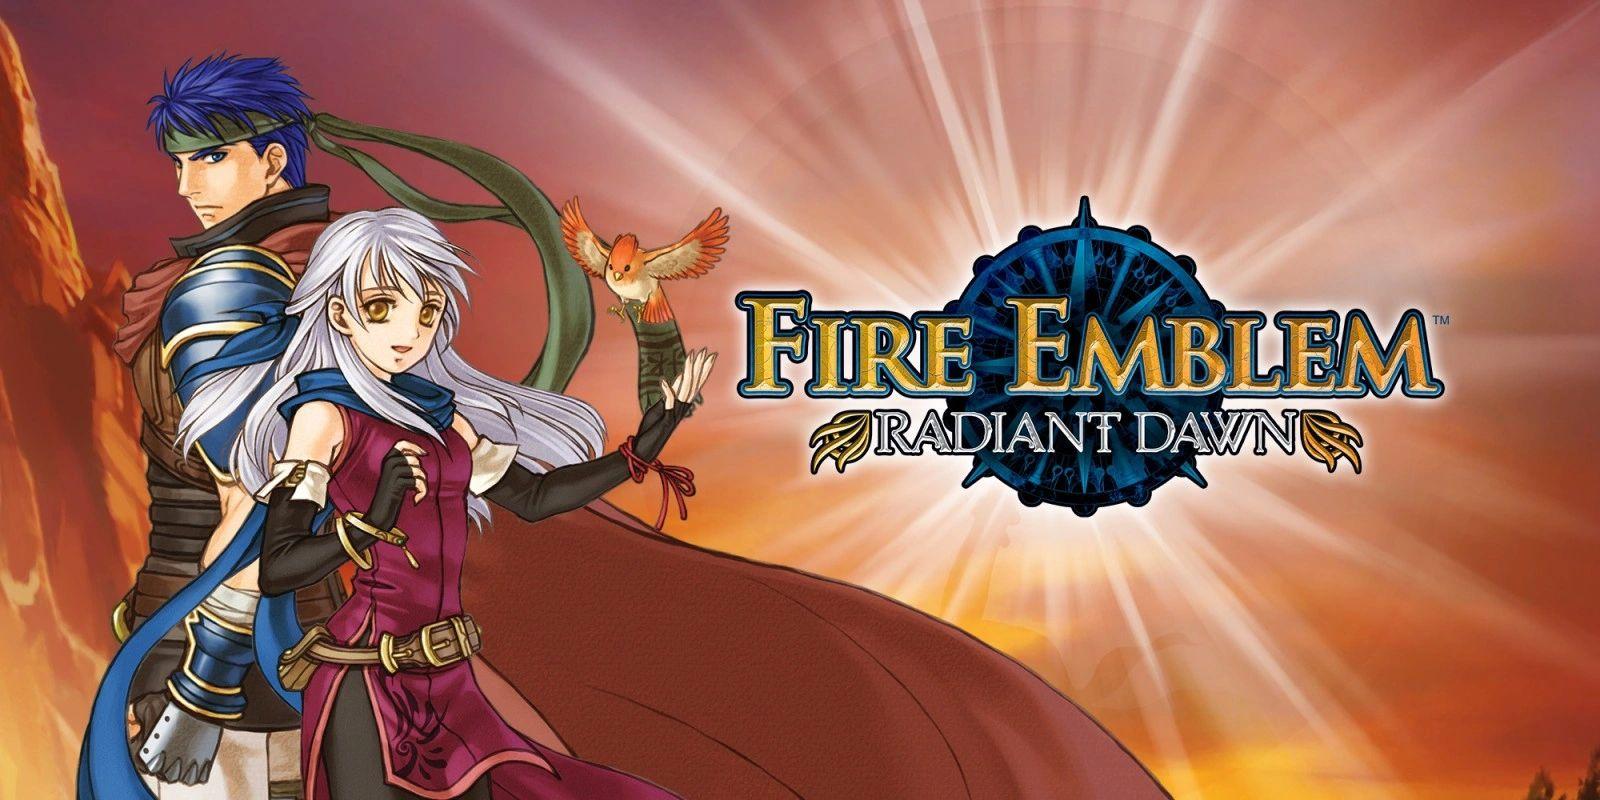 Fire Emblem Radiant Dawn